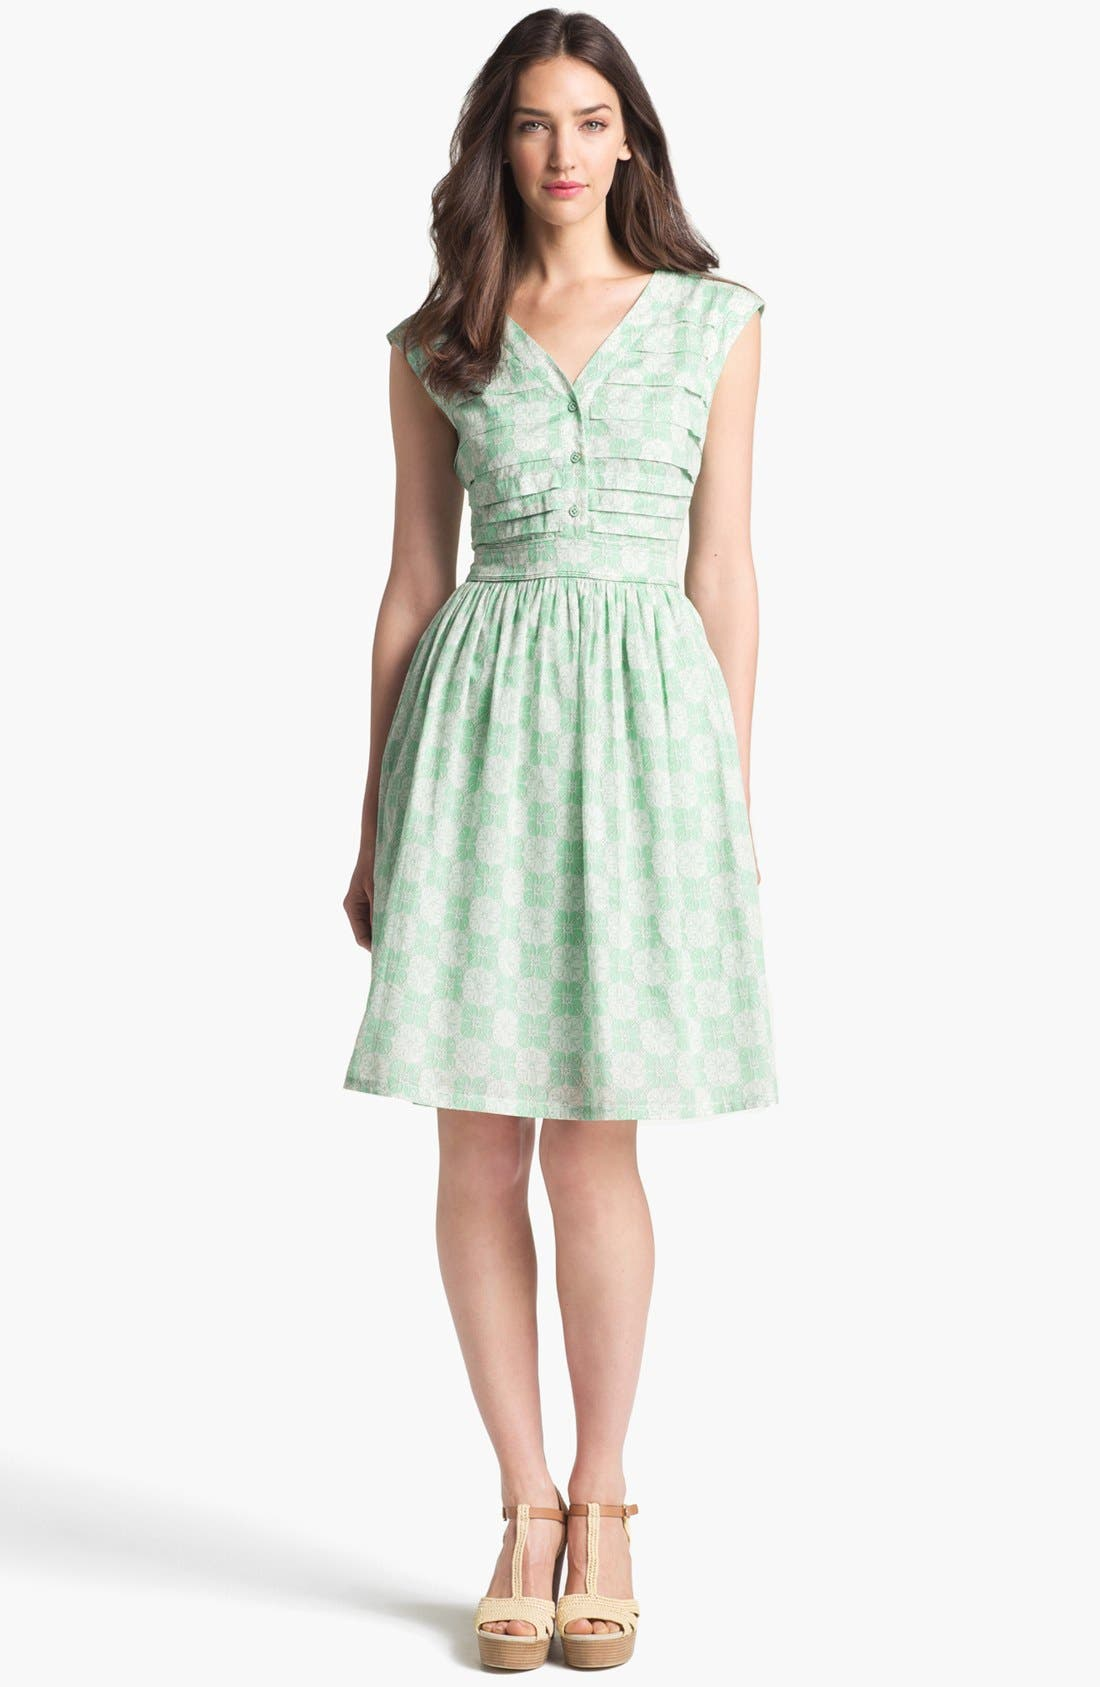 Main Image - Tory Burch 'Nico' Cotton Fit & Flare Dress